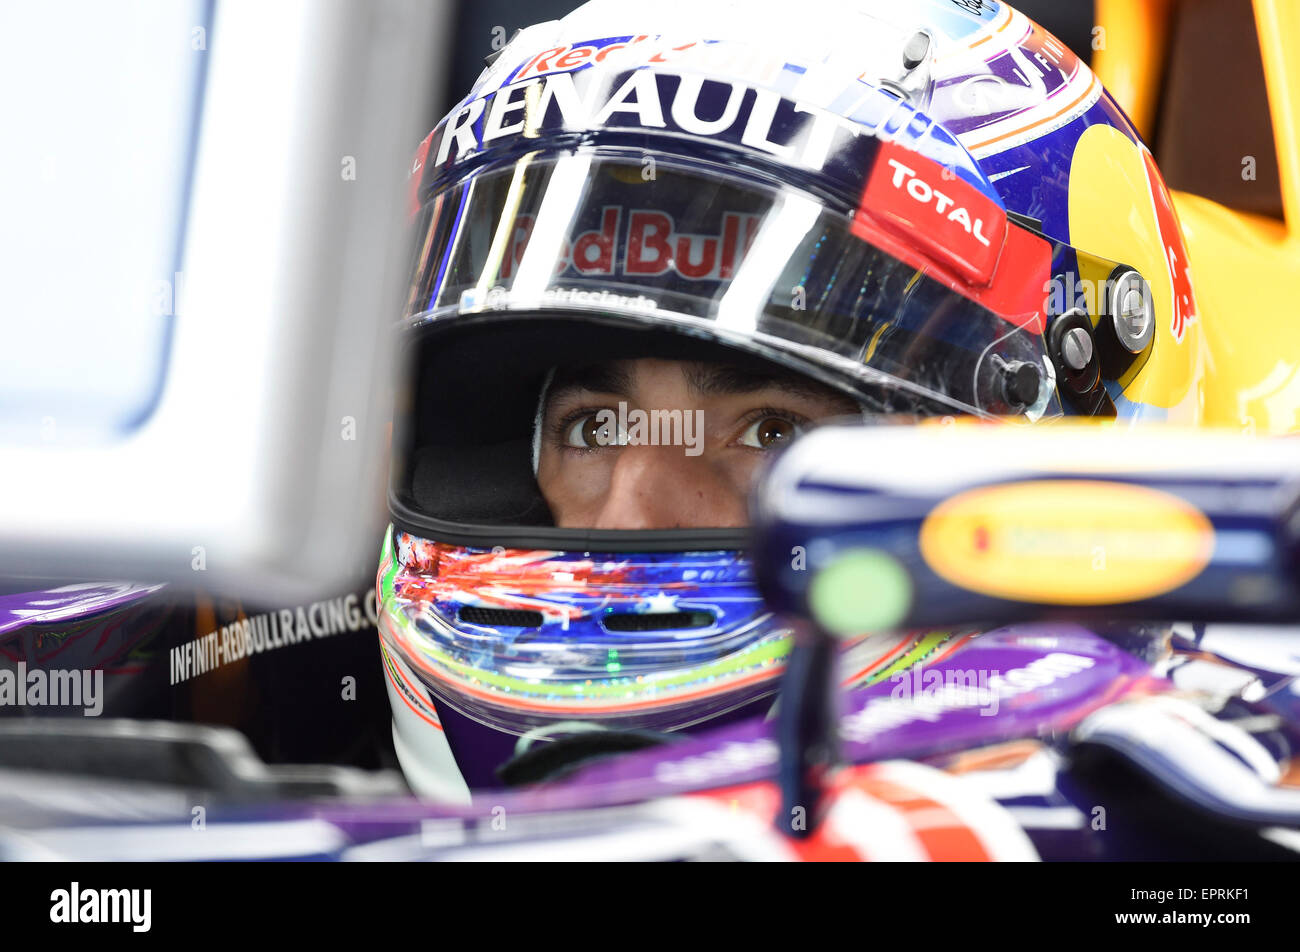 Monte Carlo, Monaco. 21. Mai 2015. Daniel Ricciardo, Red Bull Racing, Formel 1 2015, Grand Prix von Monaco, 21.05.2015. Stockbild